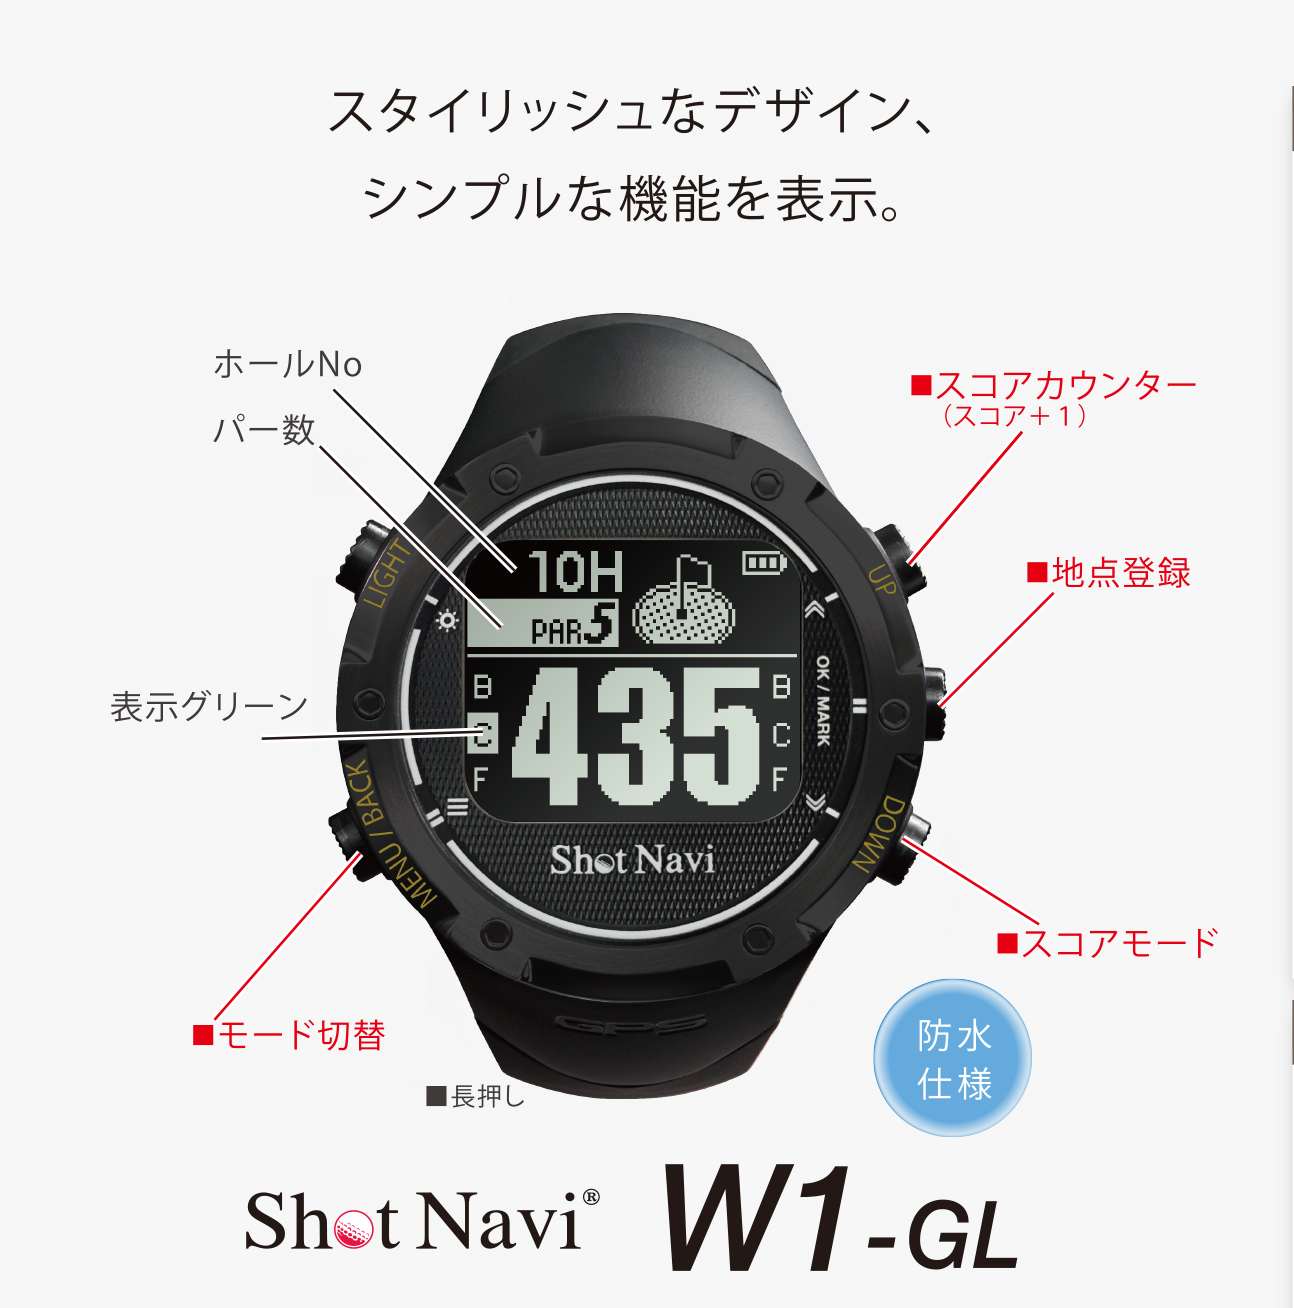 GPSゴルフナビ ShotNavi W1-GL ホワイト